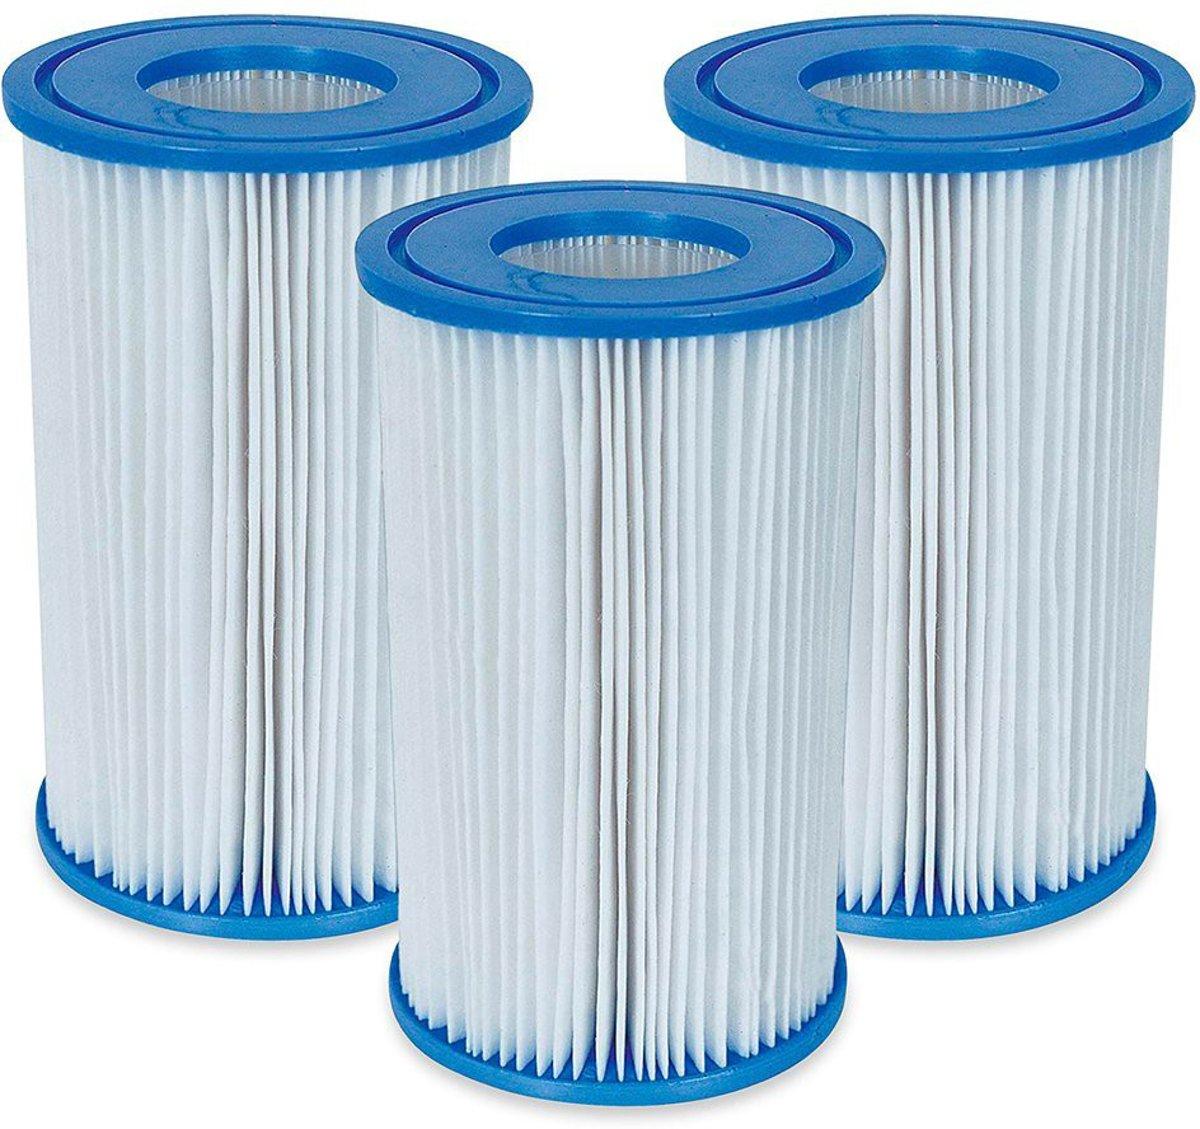 Intex Zwembad Filtercartridge Type A - 29000/59900 - 3 stuks